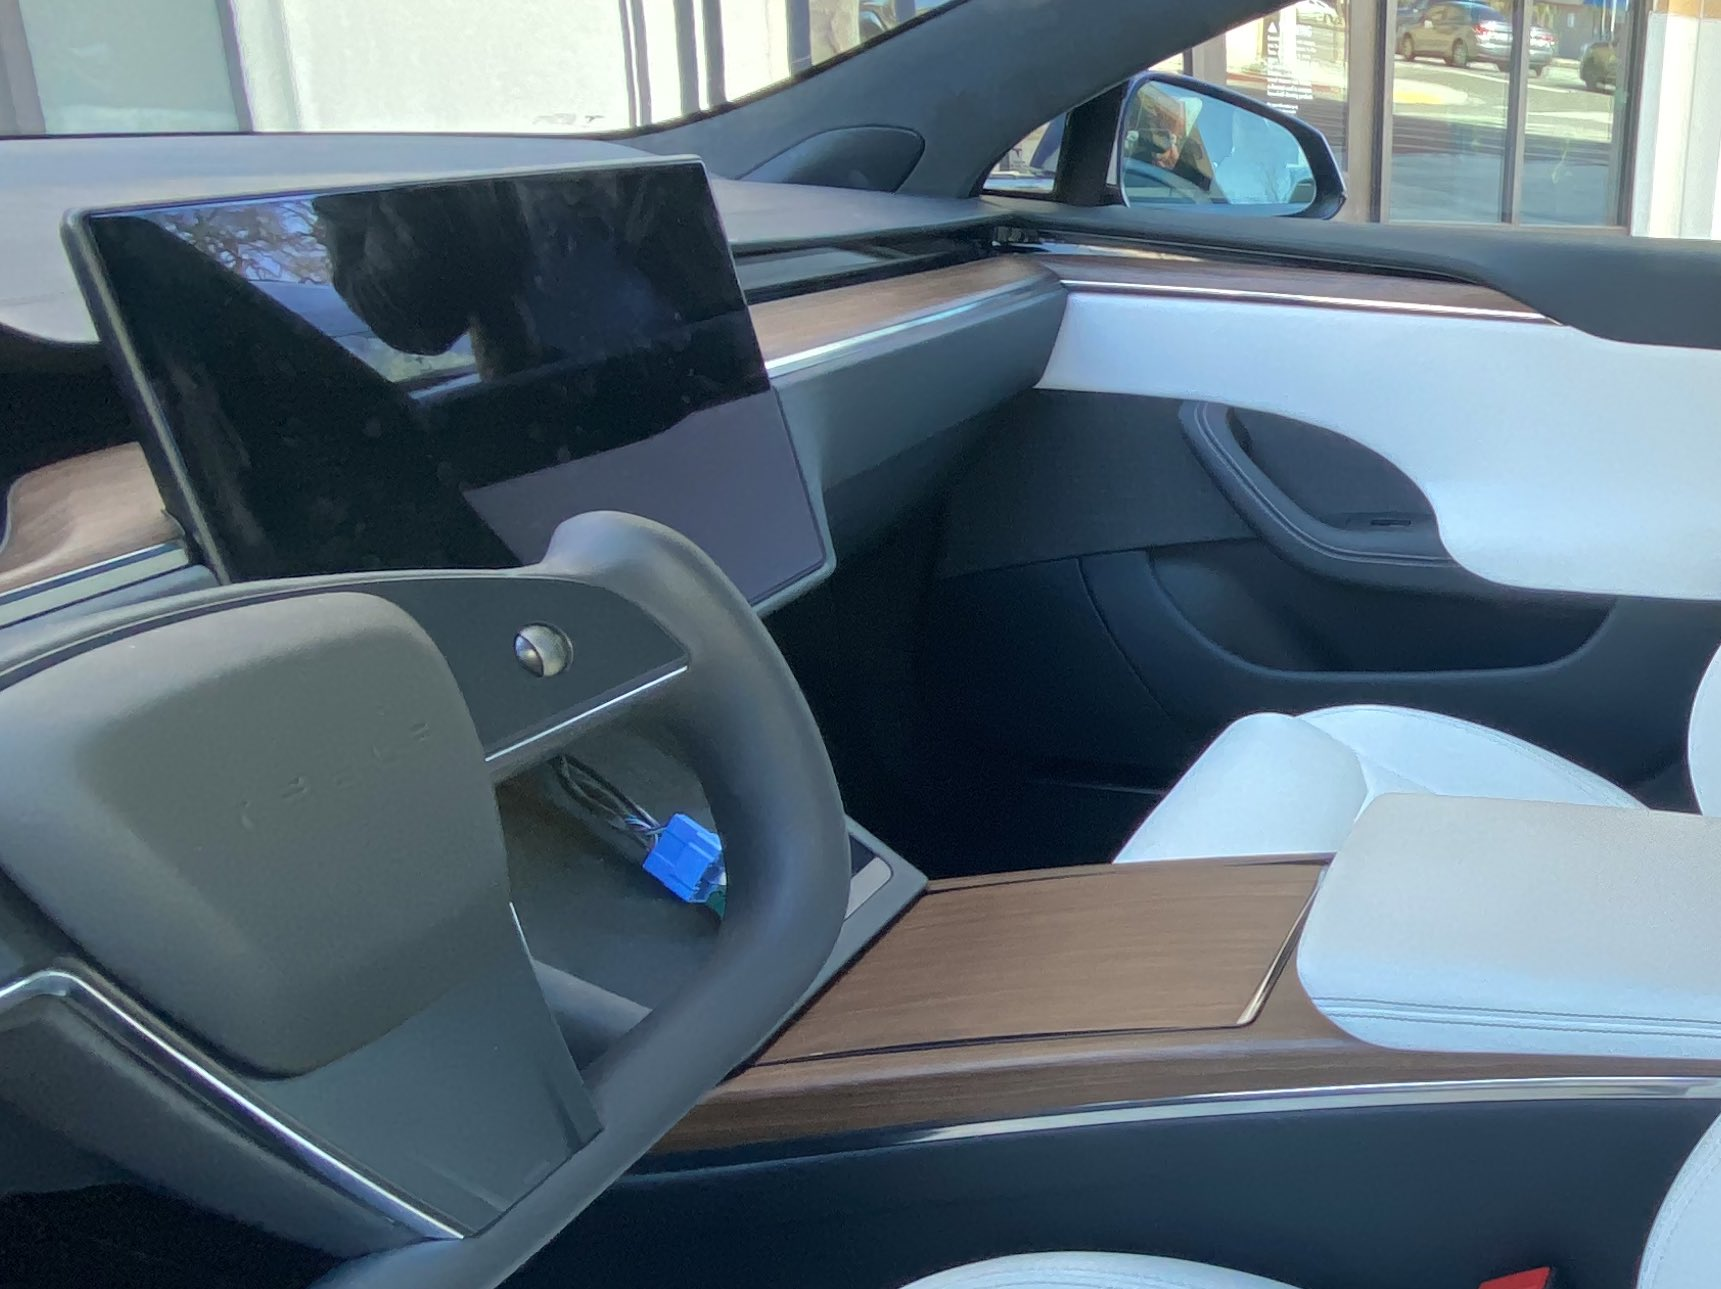 Tesla Model S Yoke steering wheel and refreshed interior (Credit: The Kilowatts)